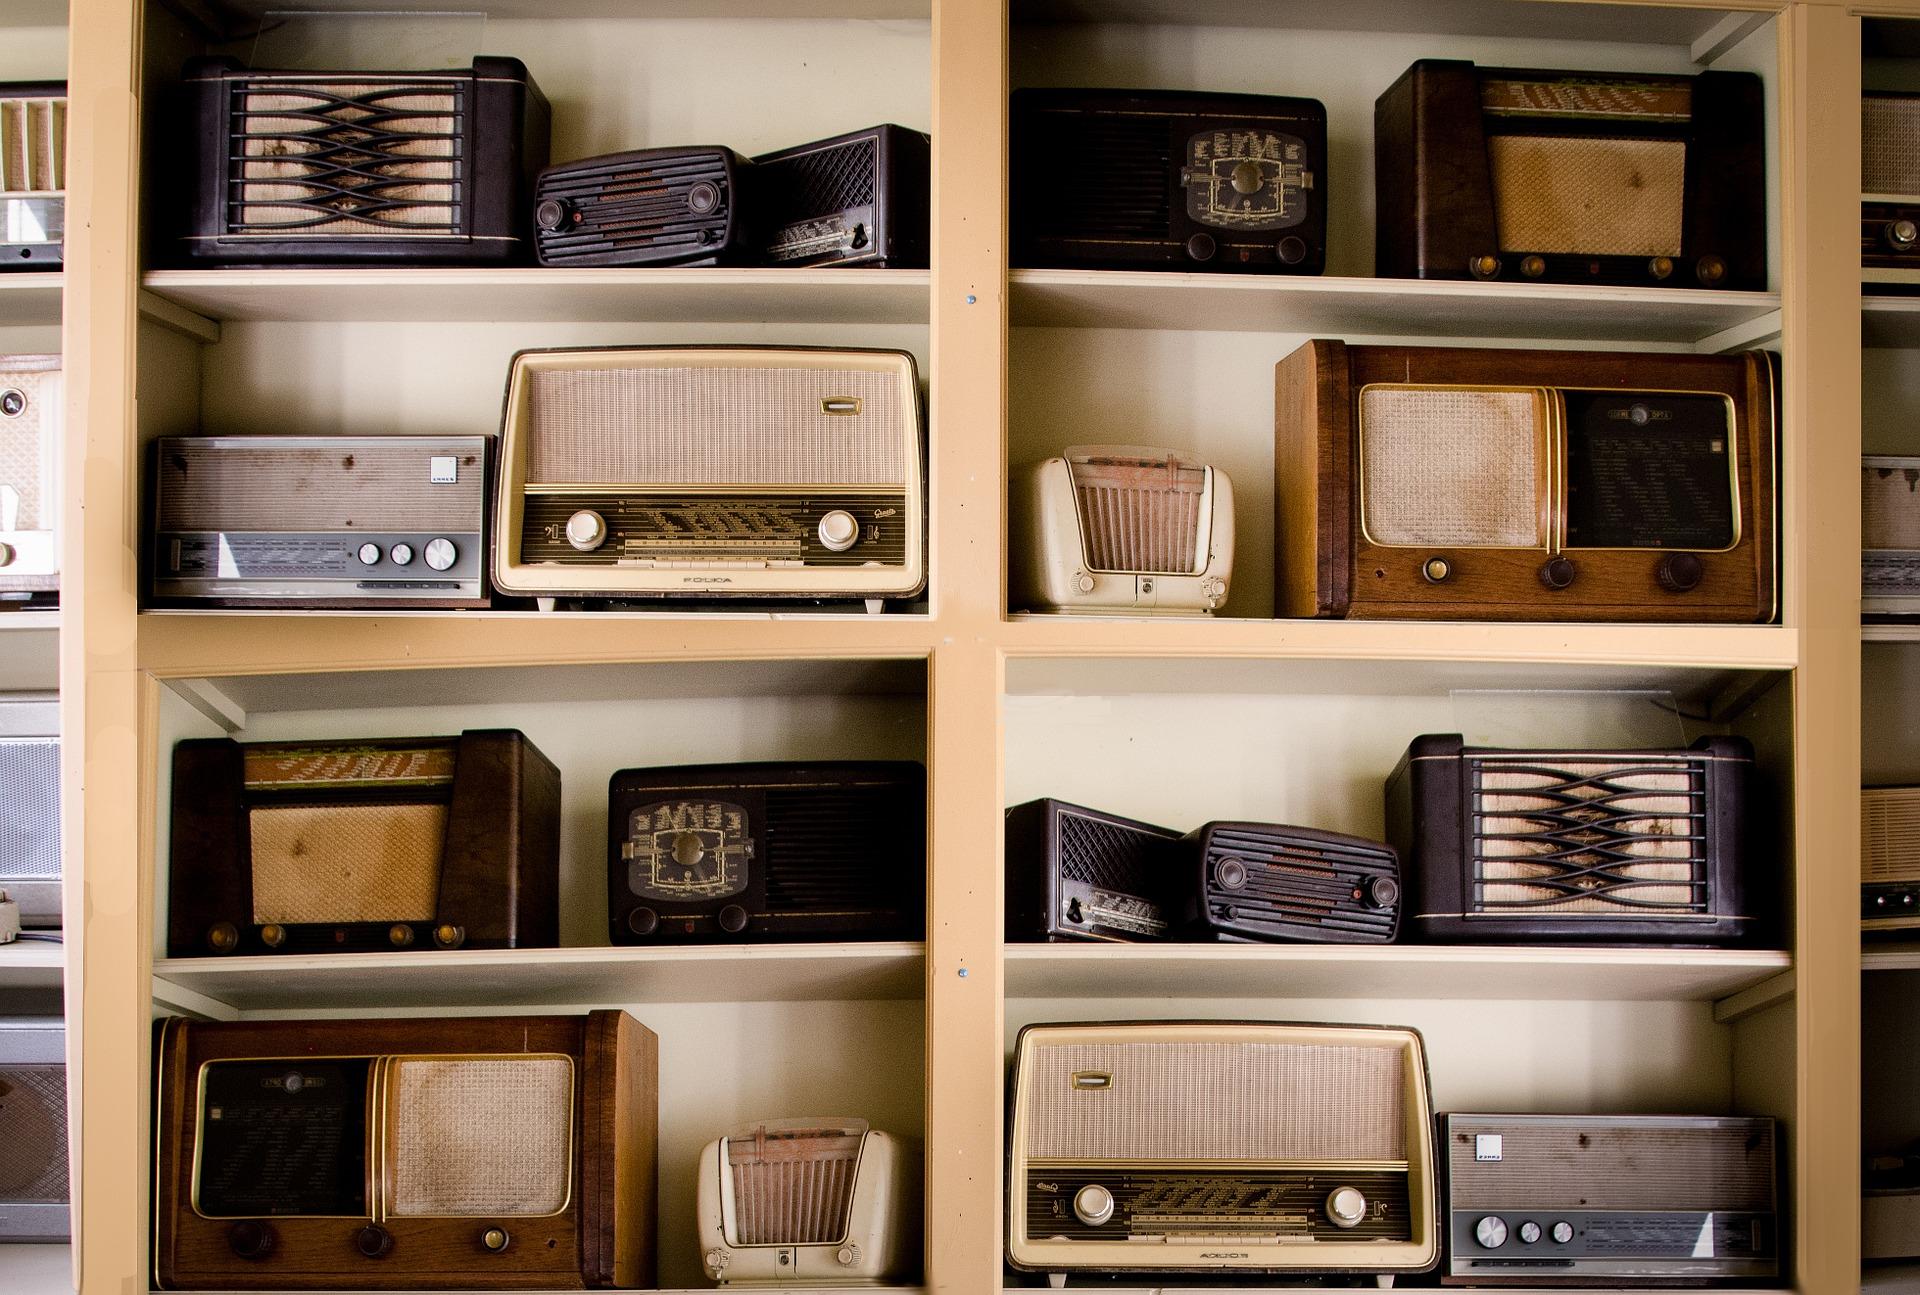 Image of vintage radios